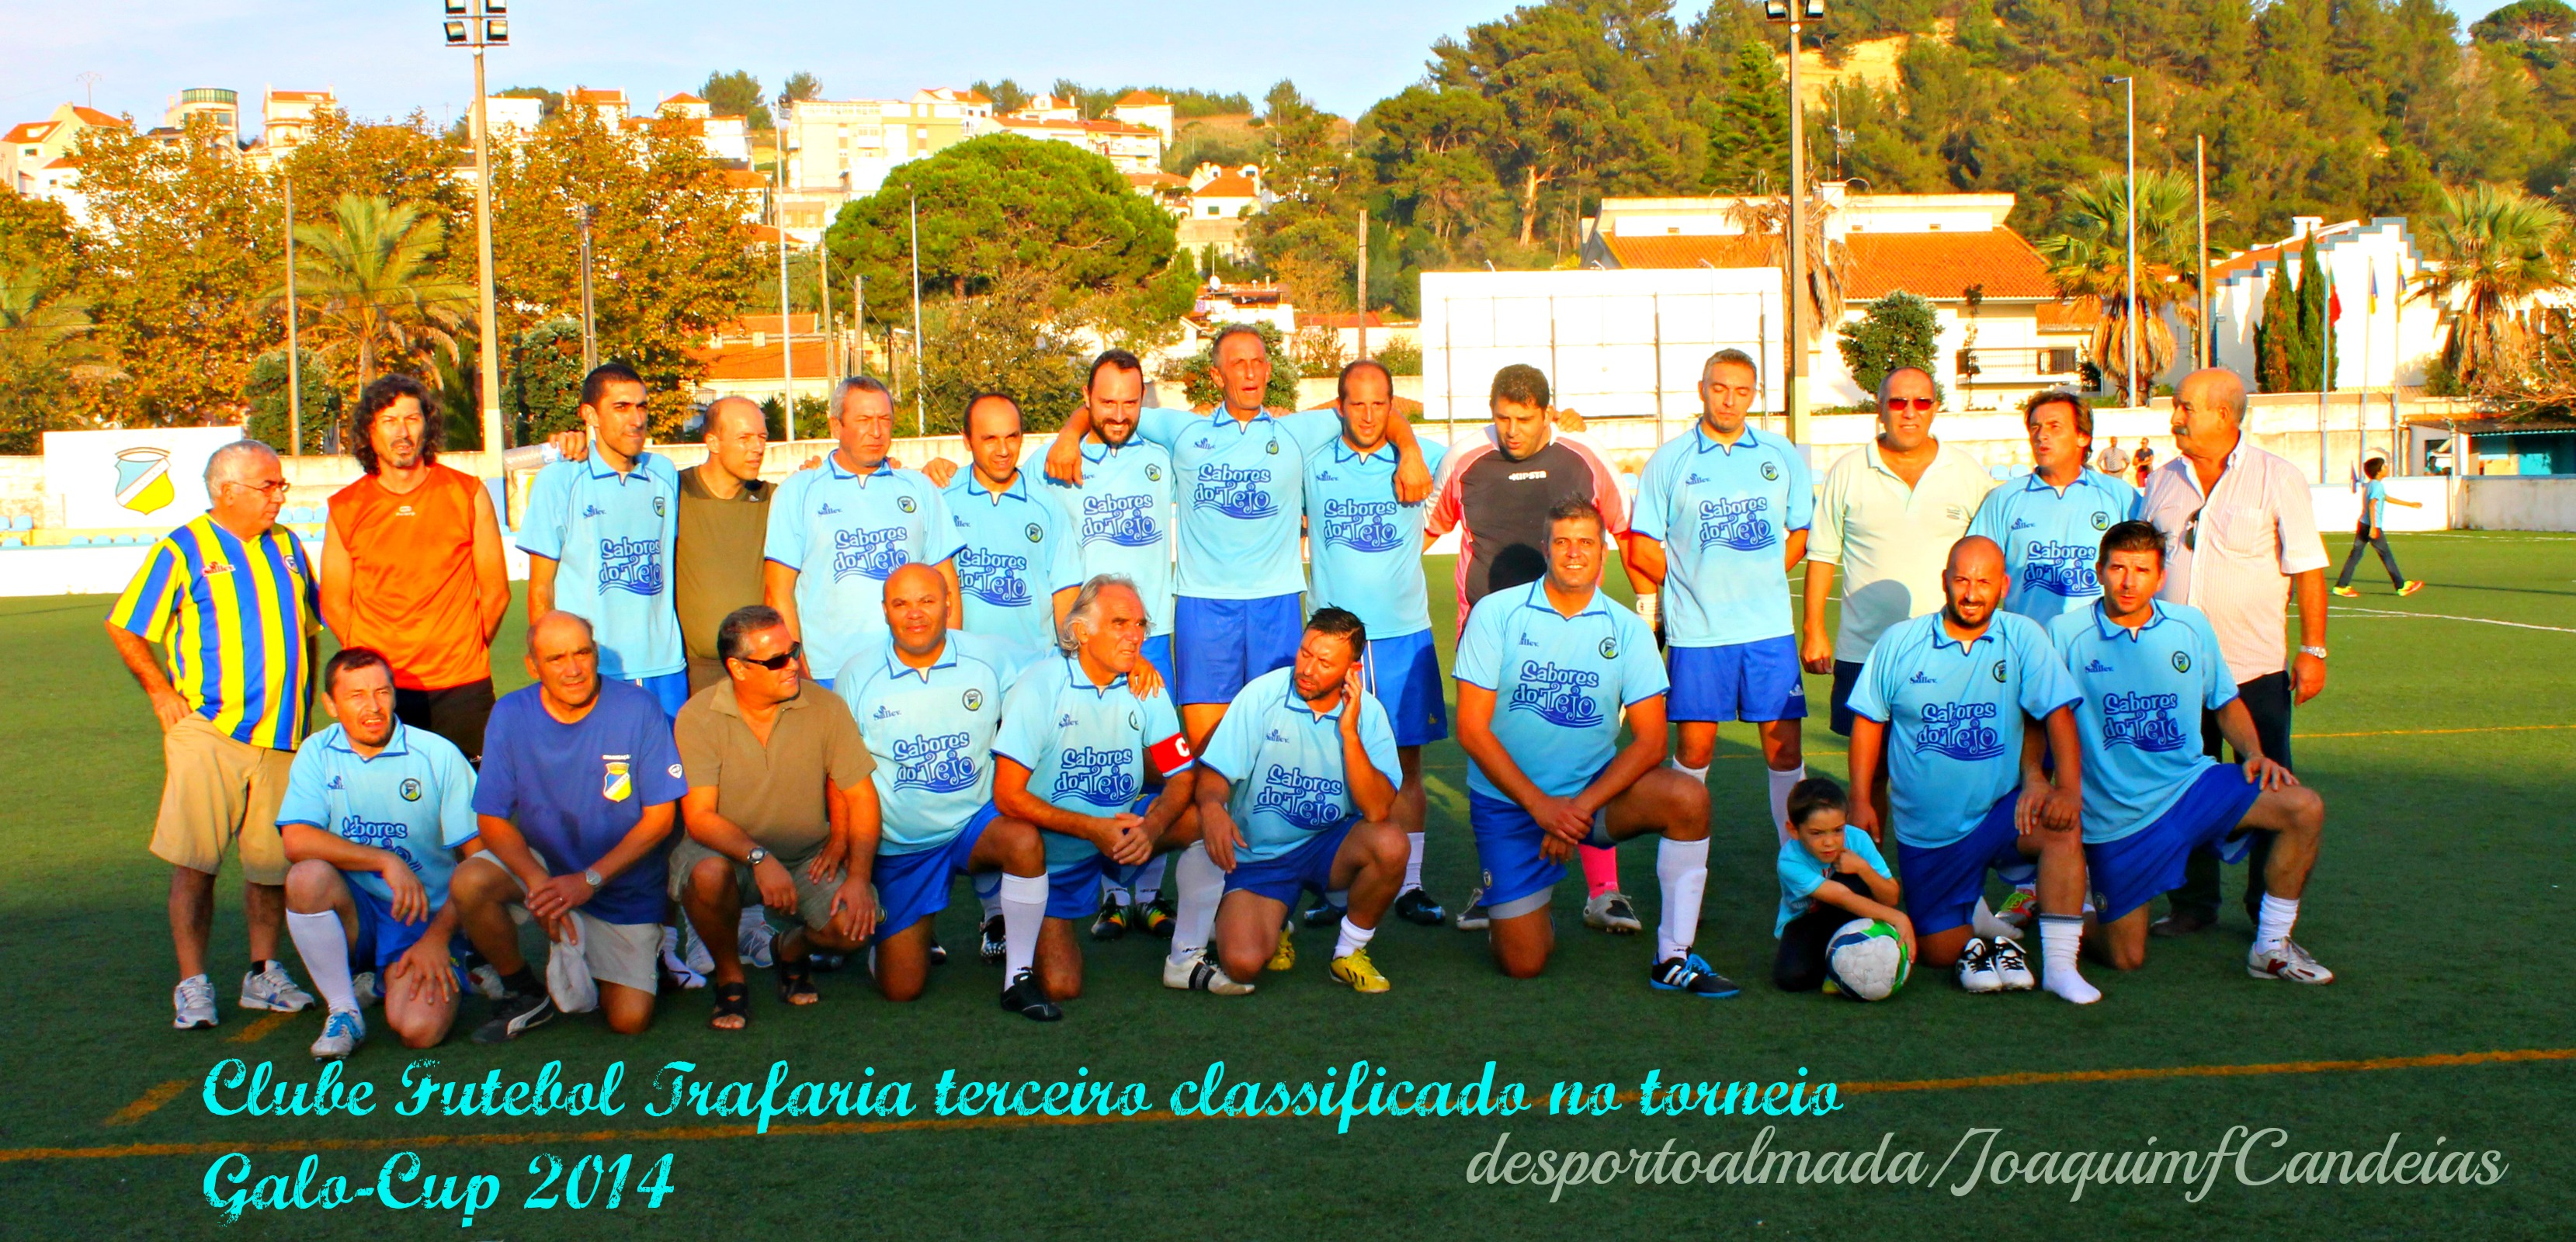 Torneio Galo Cup IMG_0599.jpg Joaquimfcandeias.jpg